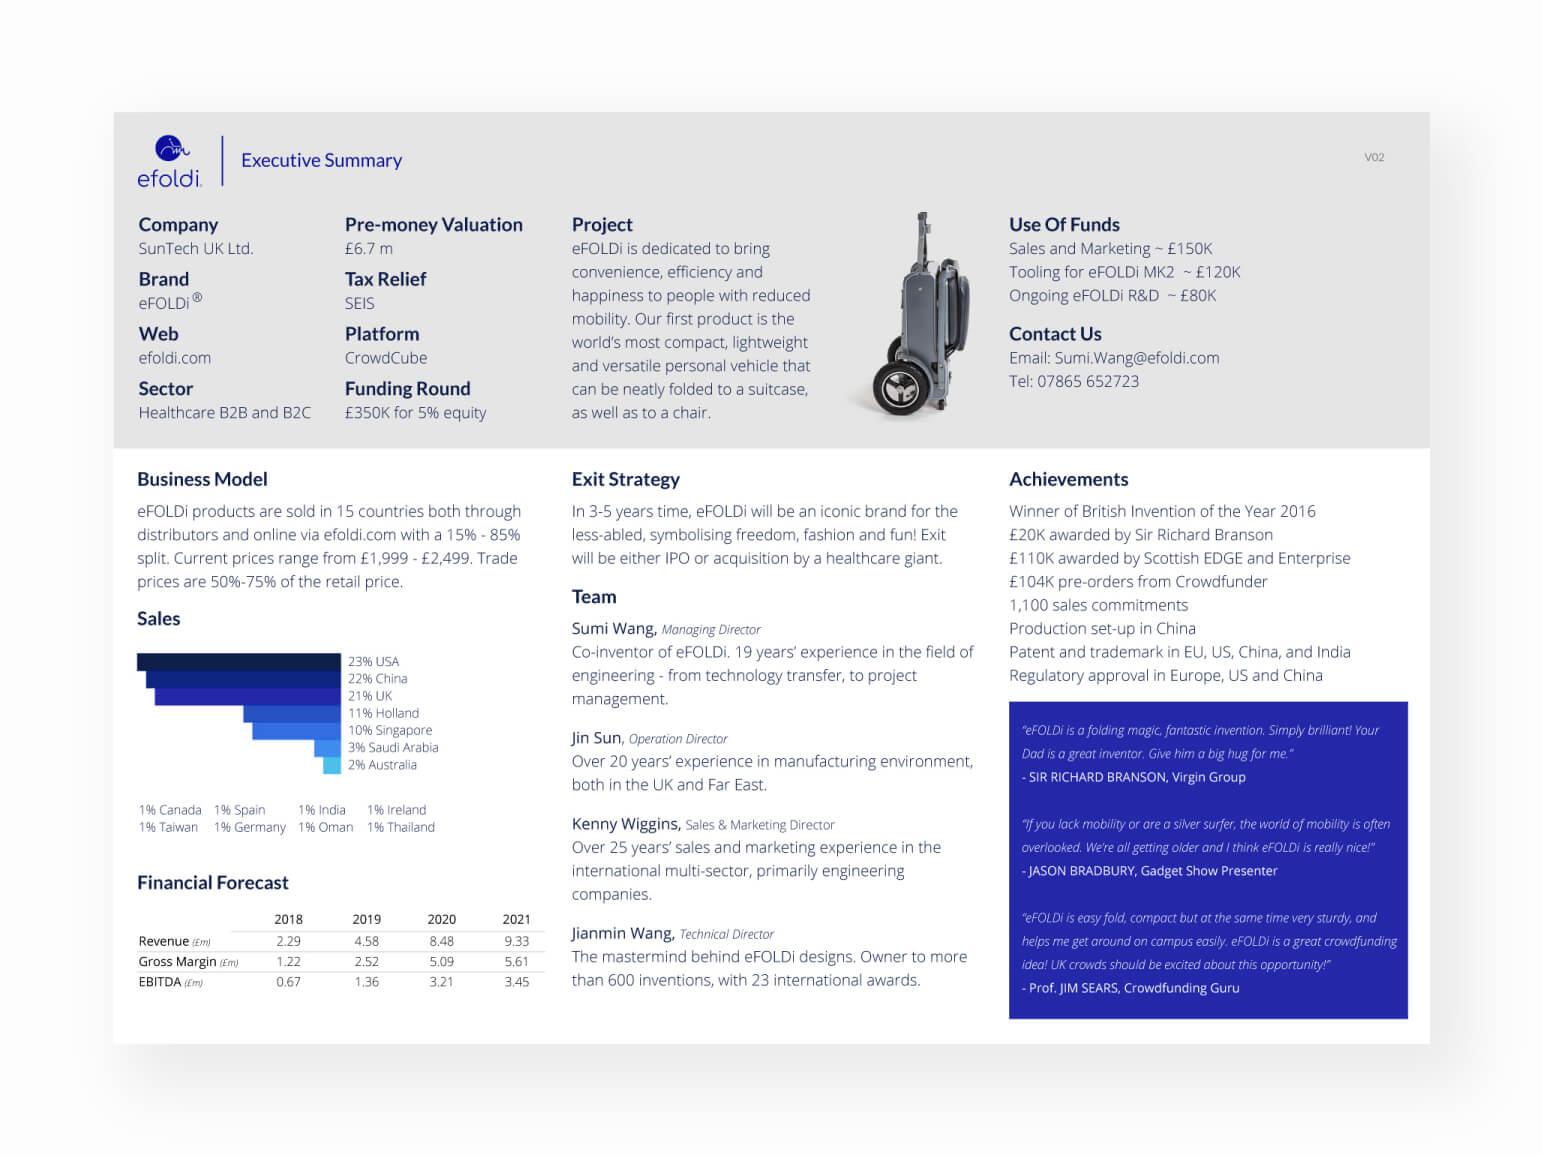 Serkan_Ferah_Branding_Pitching_Design_London_eFoldi-rebranding-crowdfunding-marketing-pitching-pitch-design-01.jpg